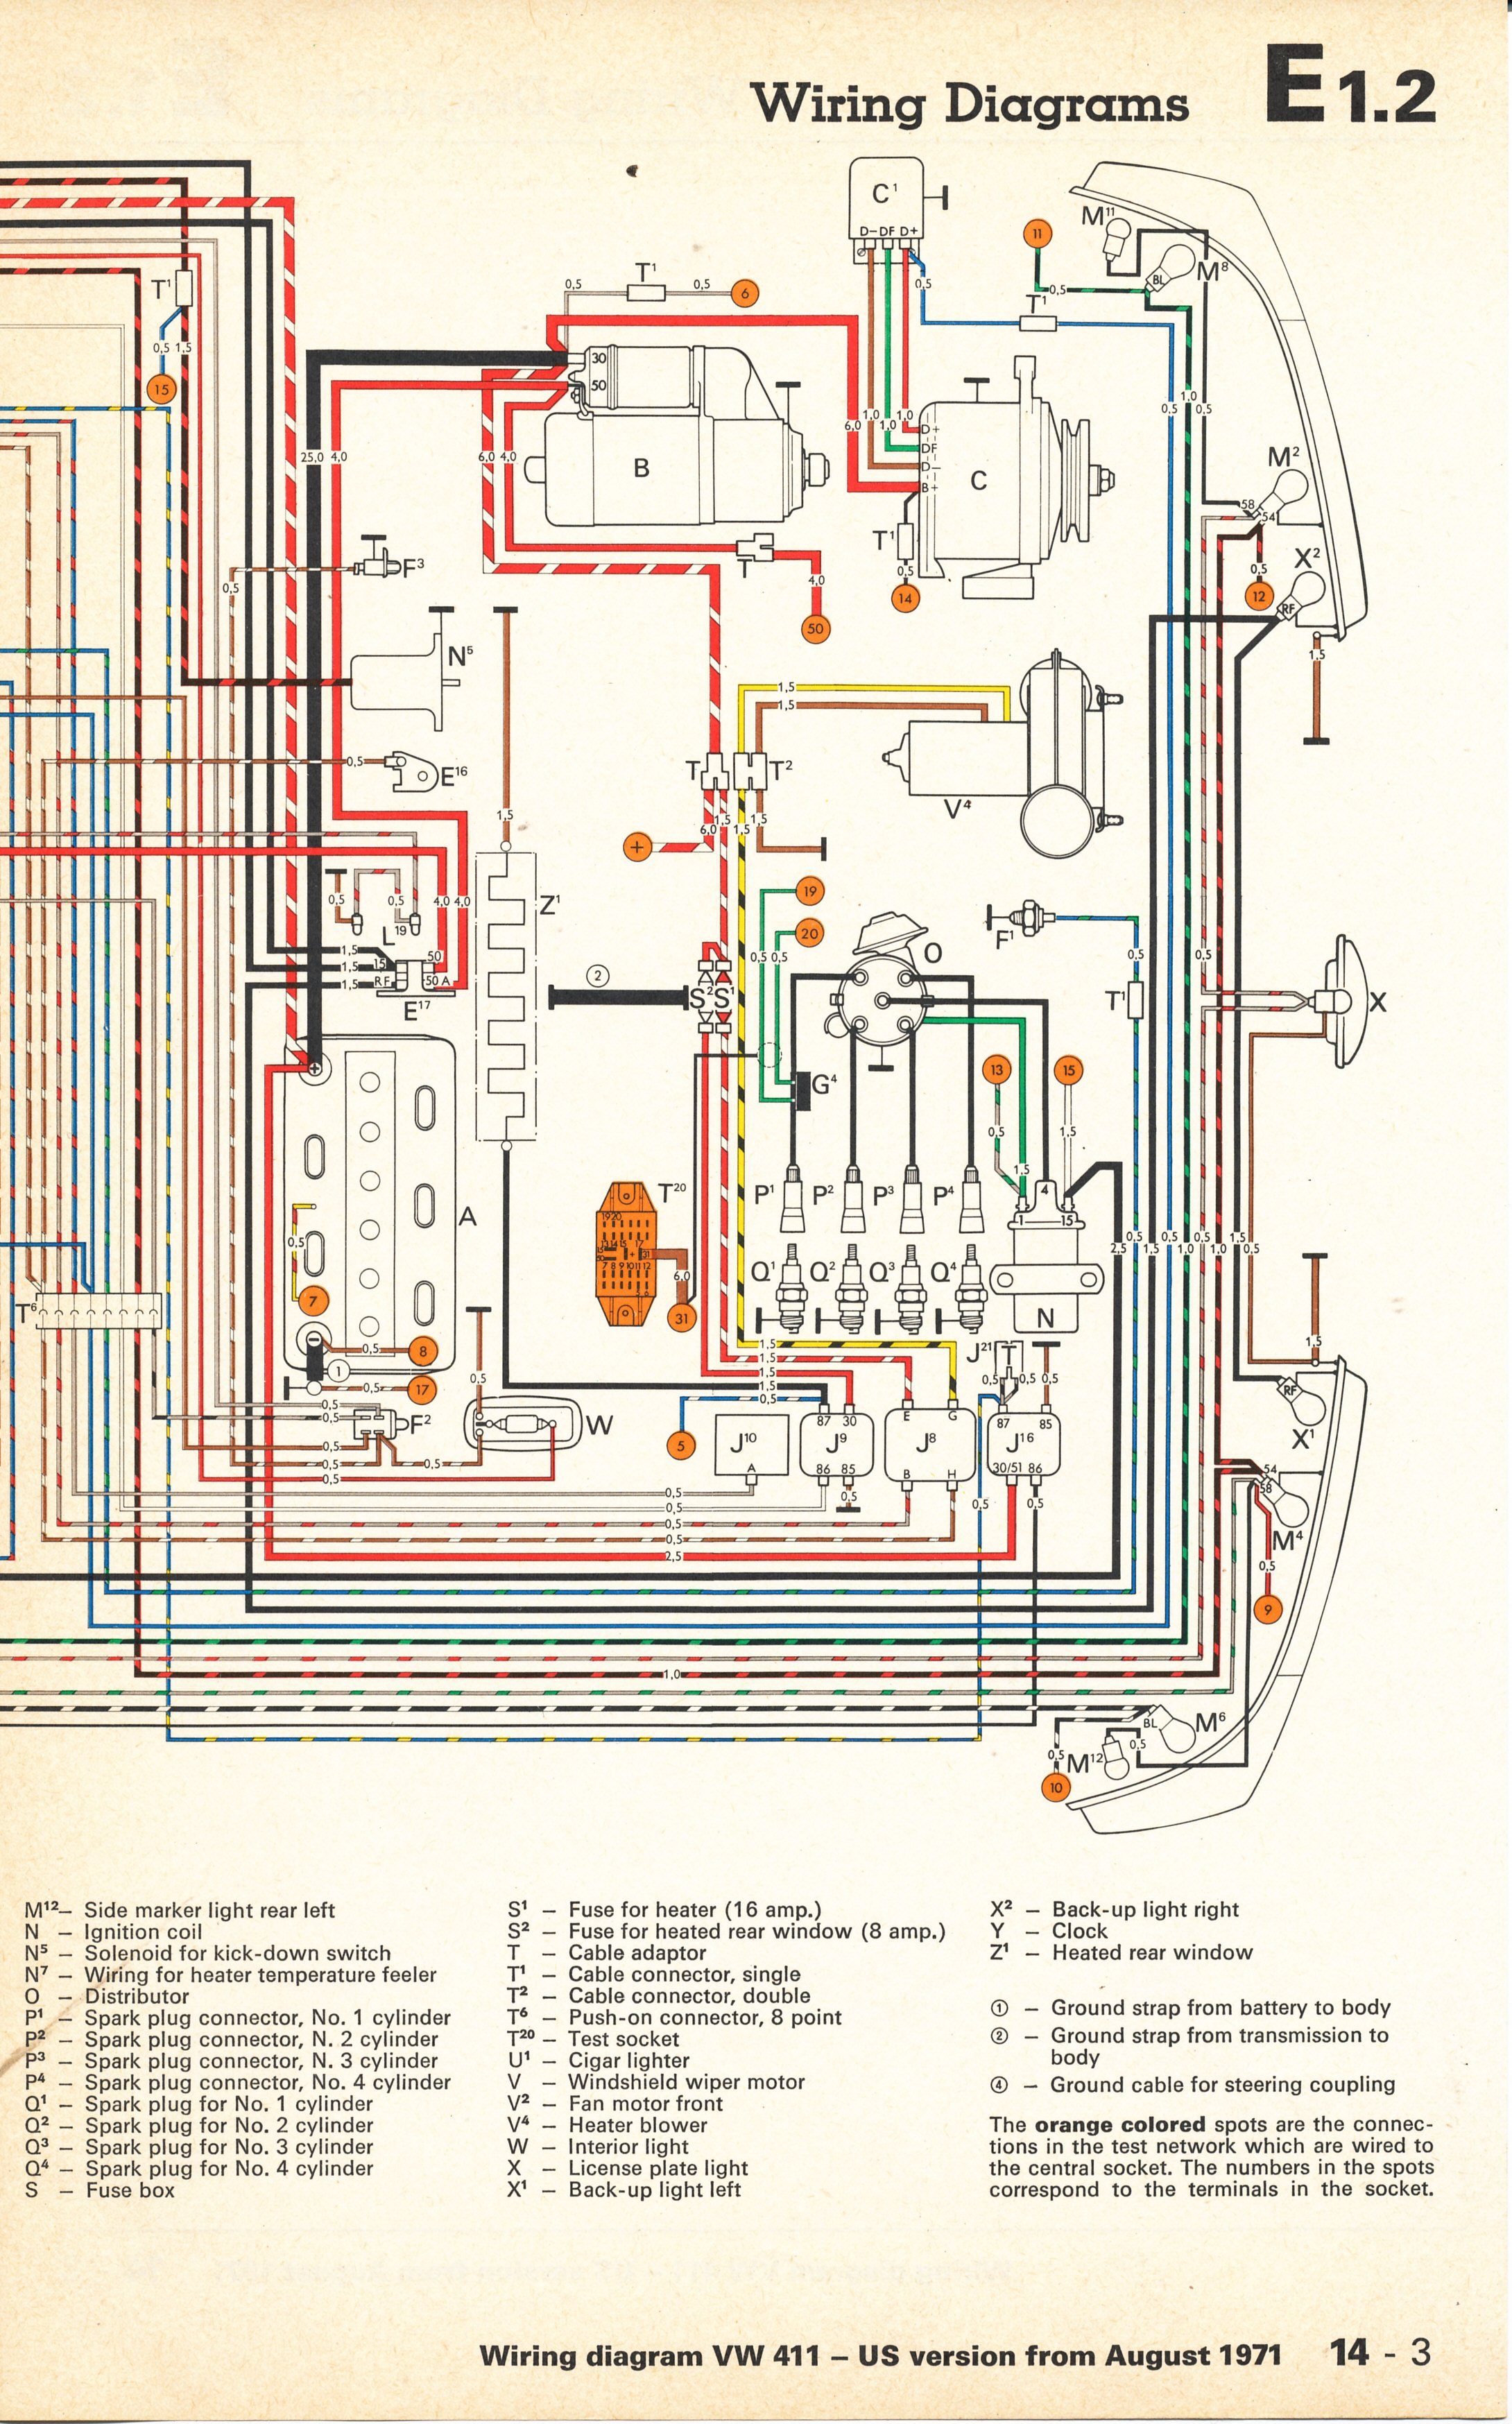 411_1972b_usversion?resize\\\\\\\\\\\\\\\\\\\\\\\\\\\\\\\=665%2C1066 2002 impala wiring diagram 2002 chevy impala bcm diagram \u2022 free 1965 Impala at webbmarketing.co